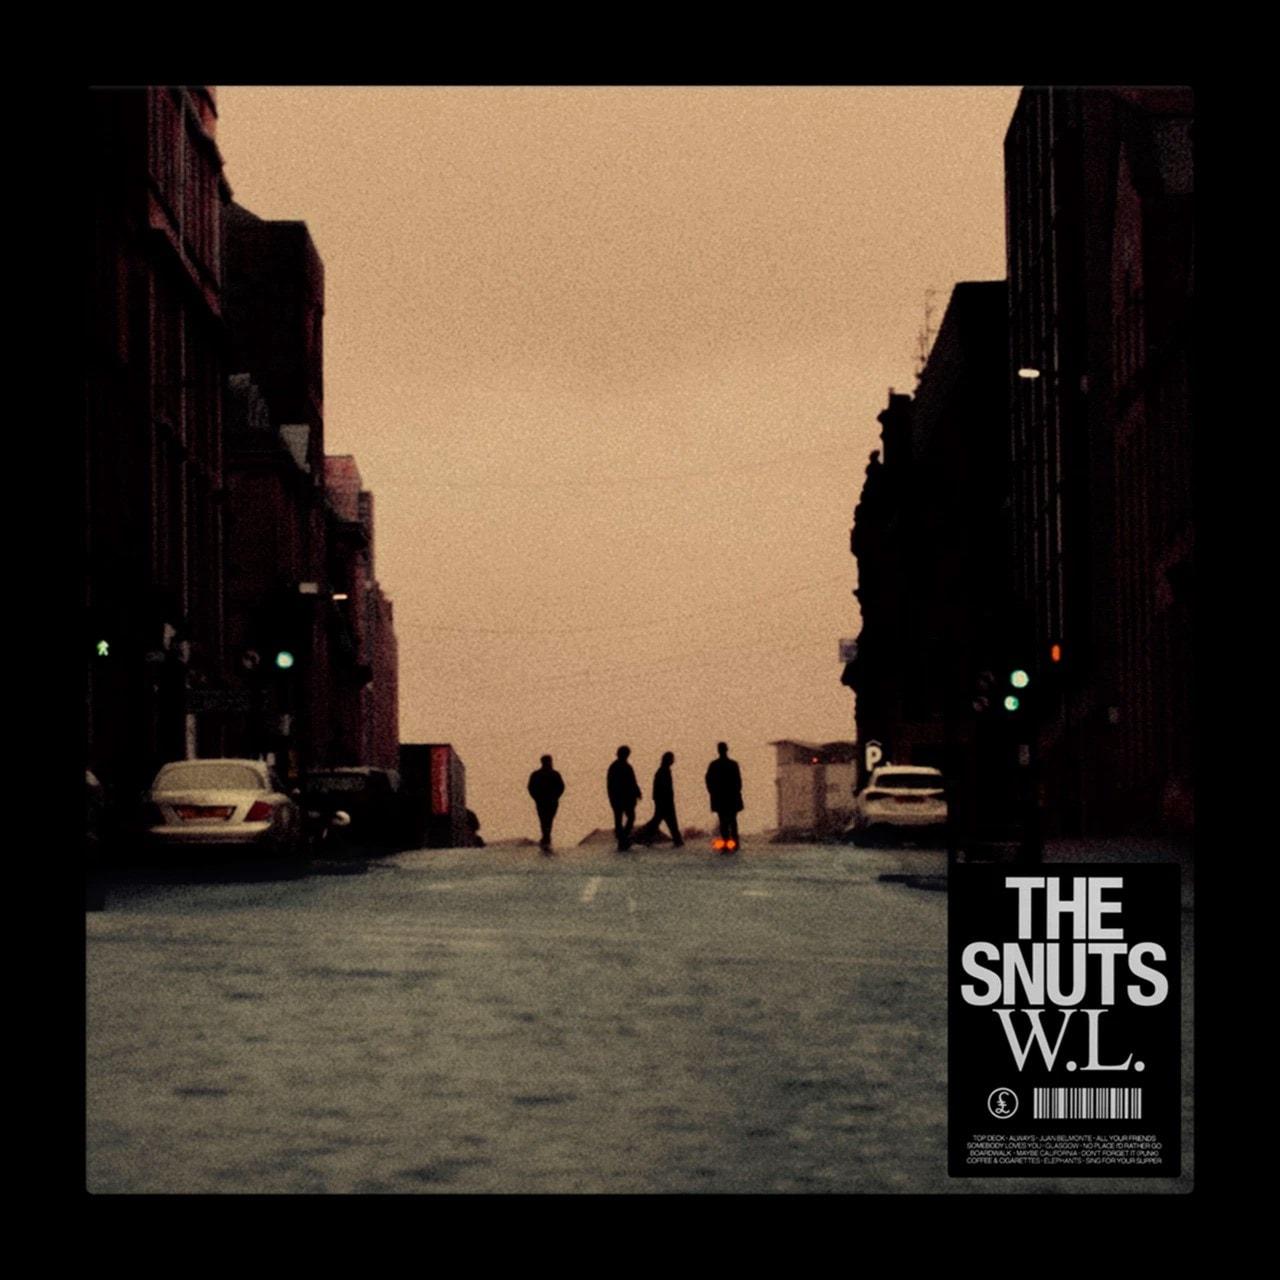 The Snuts - W.L. - CD & Birmingham Event Entry - 1